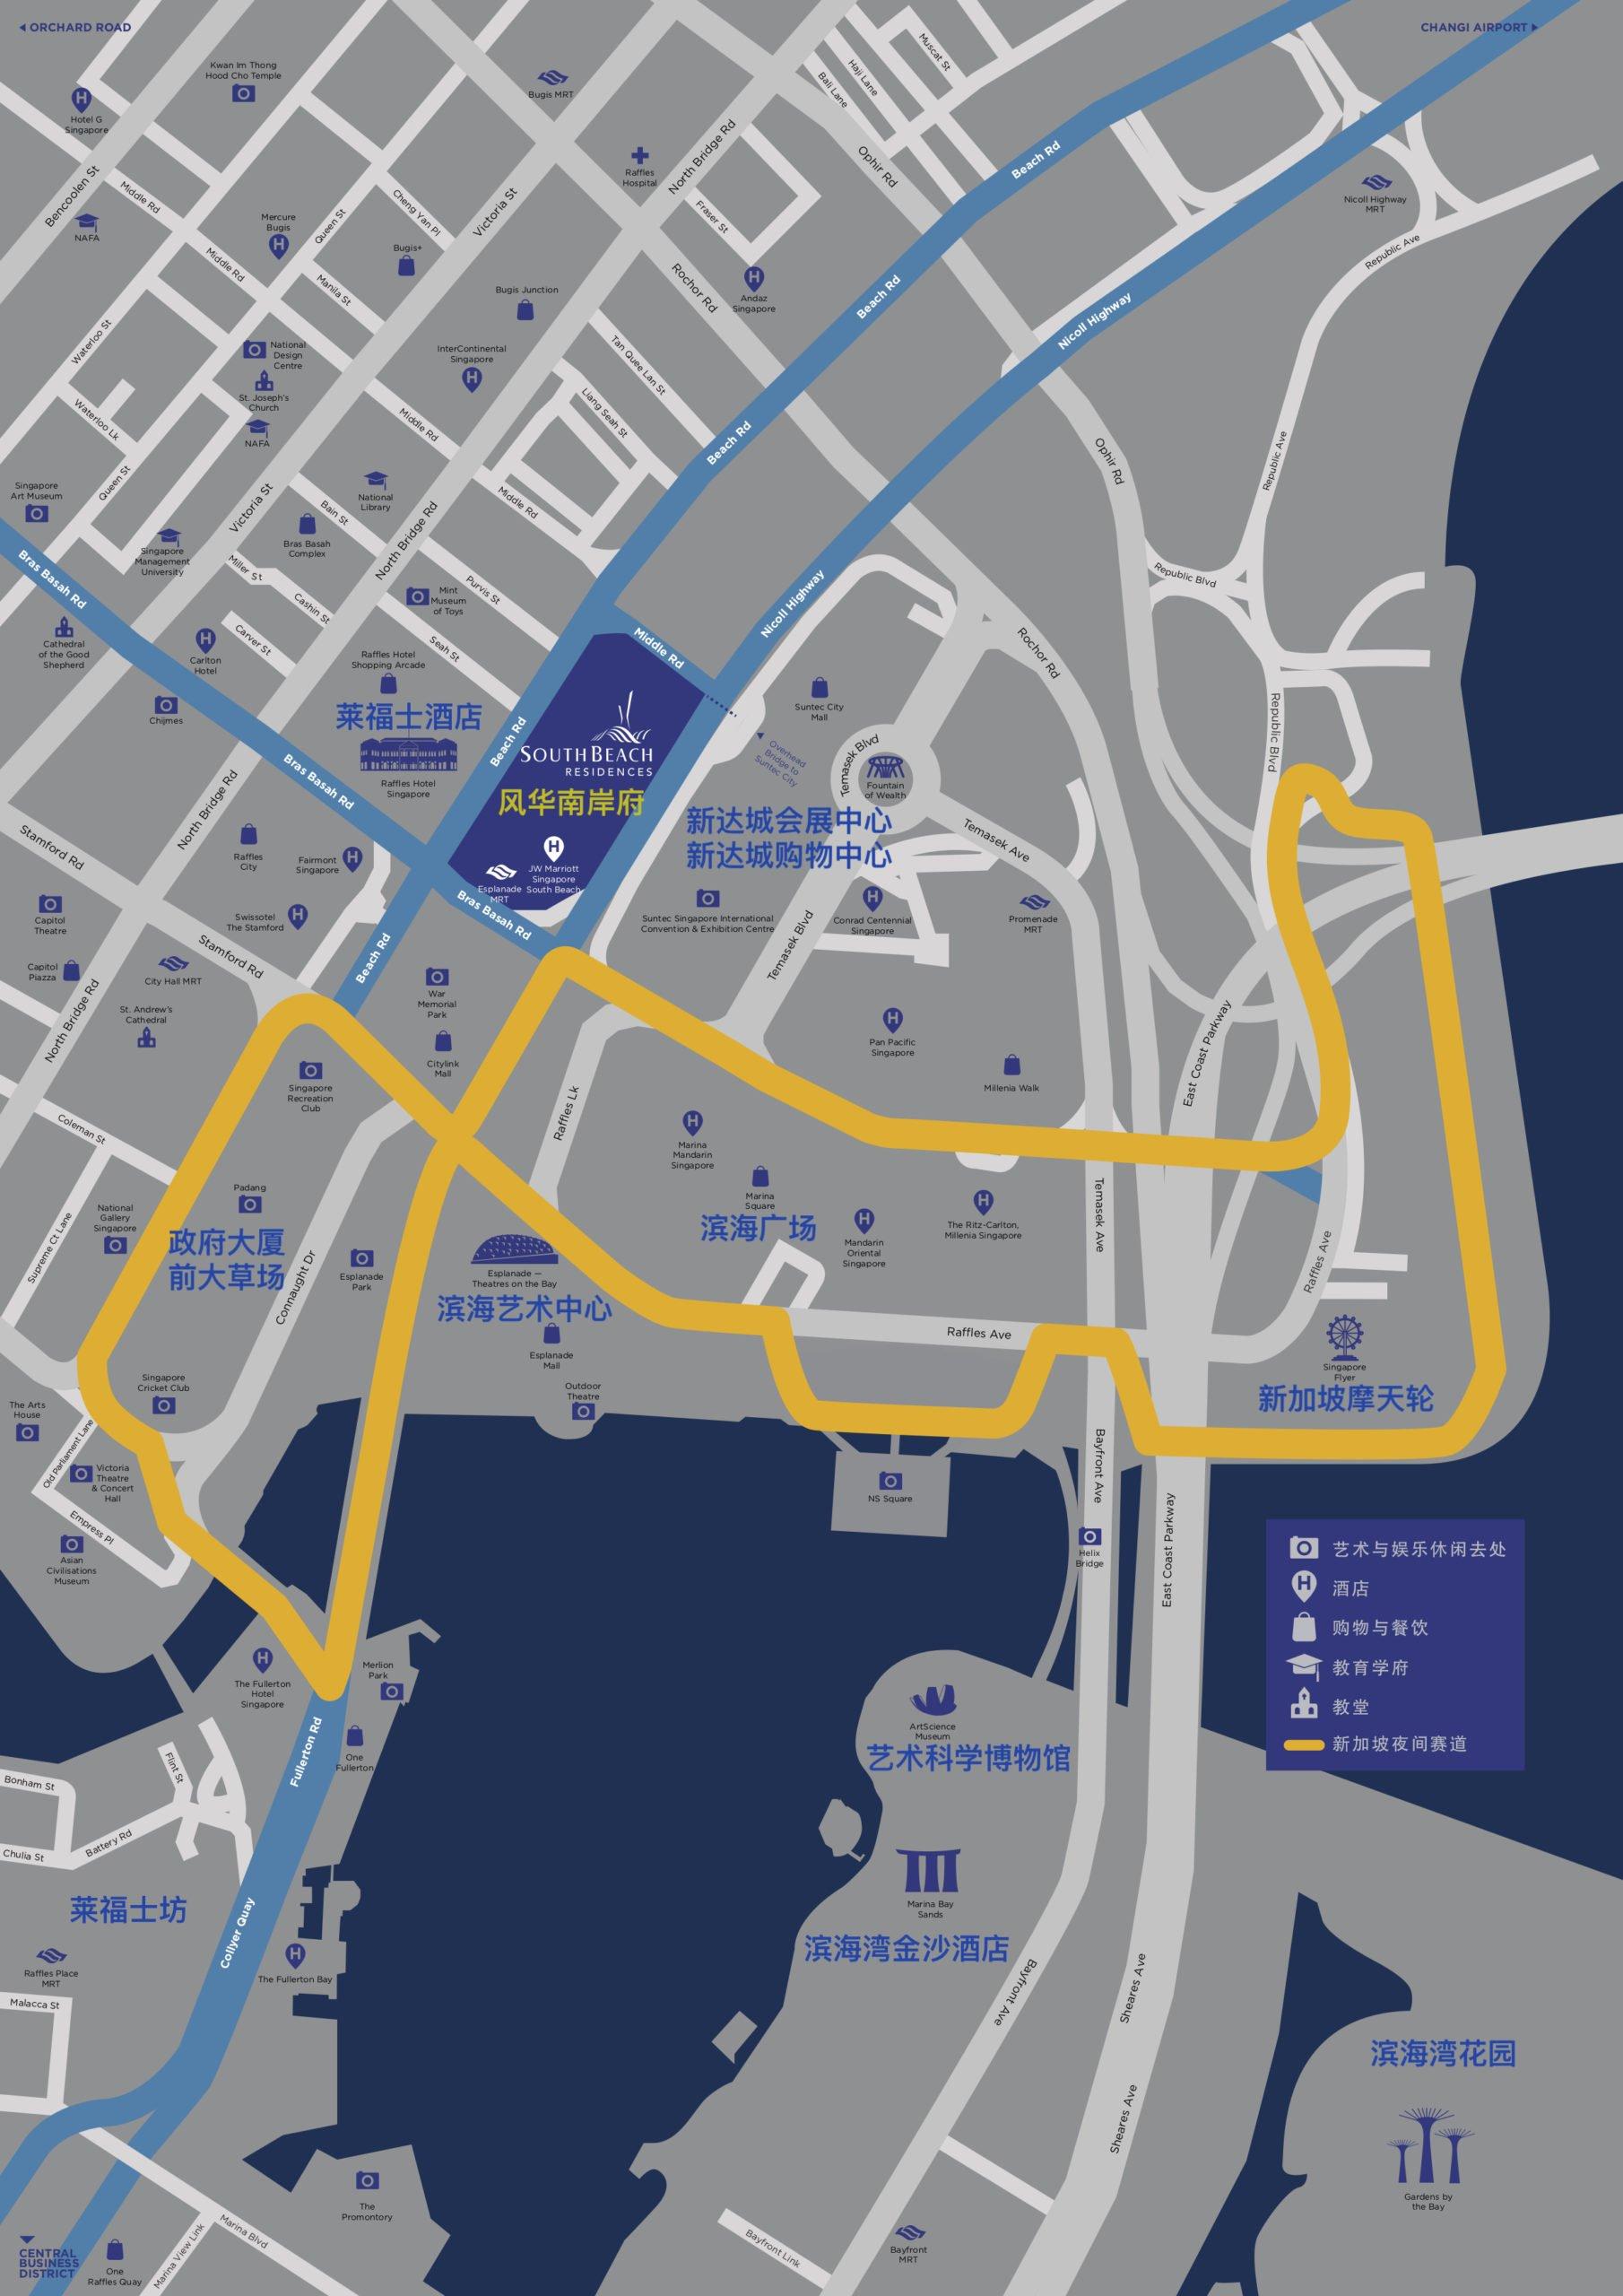 South Beach Residences 风华南岸府地段地图